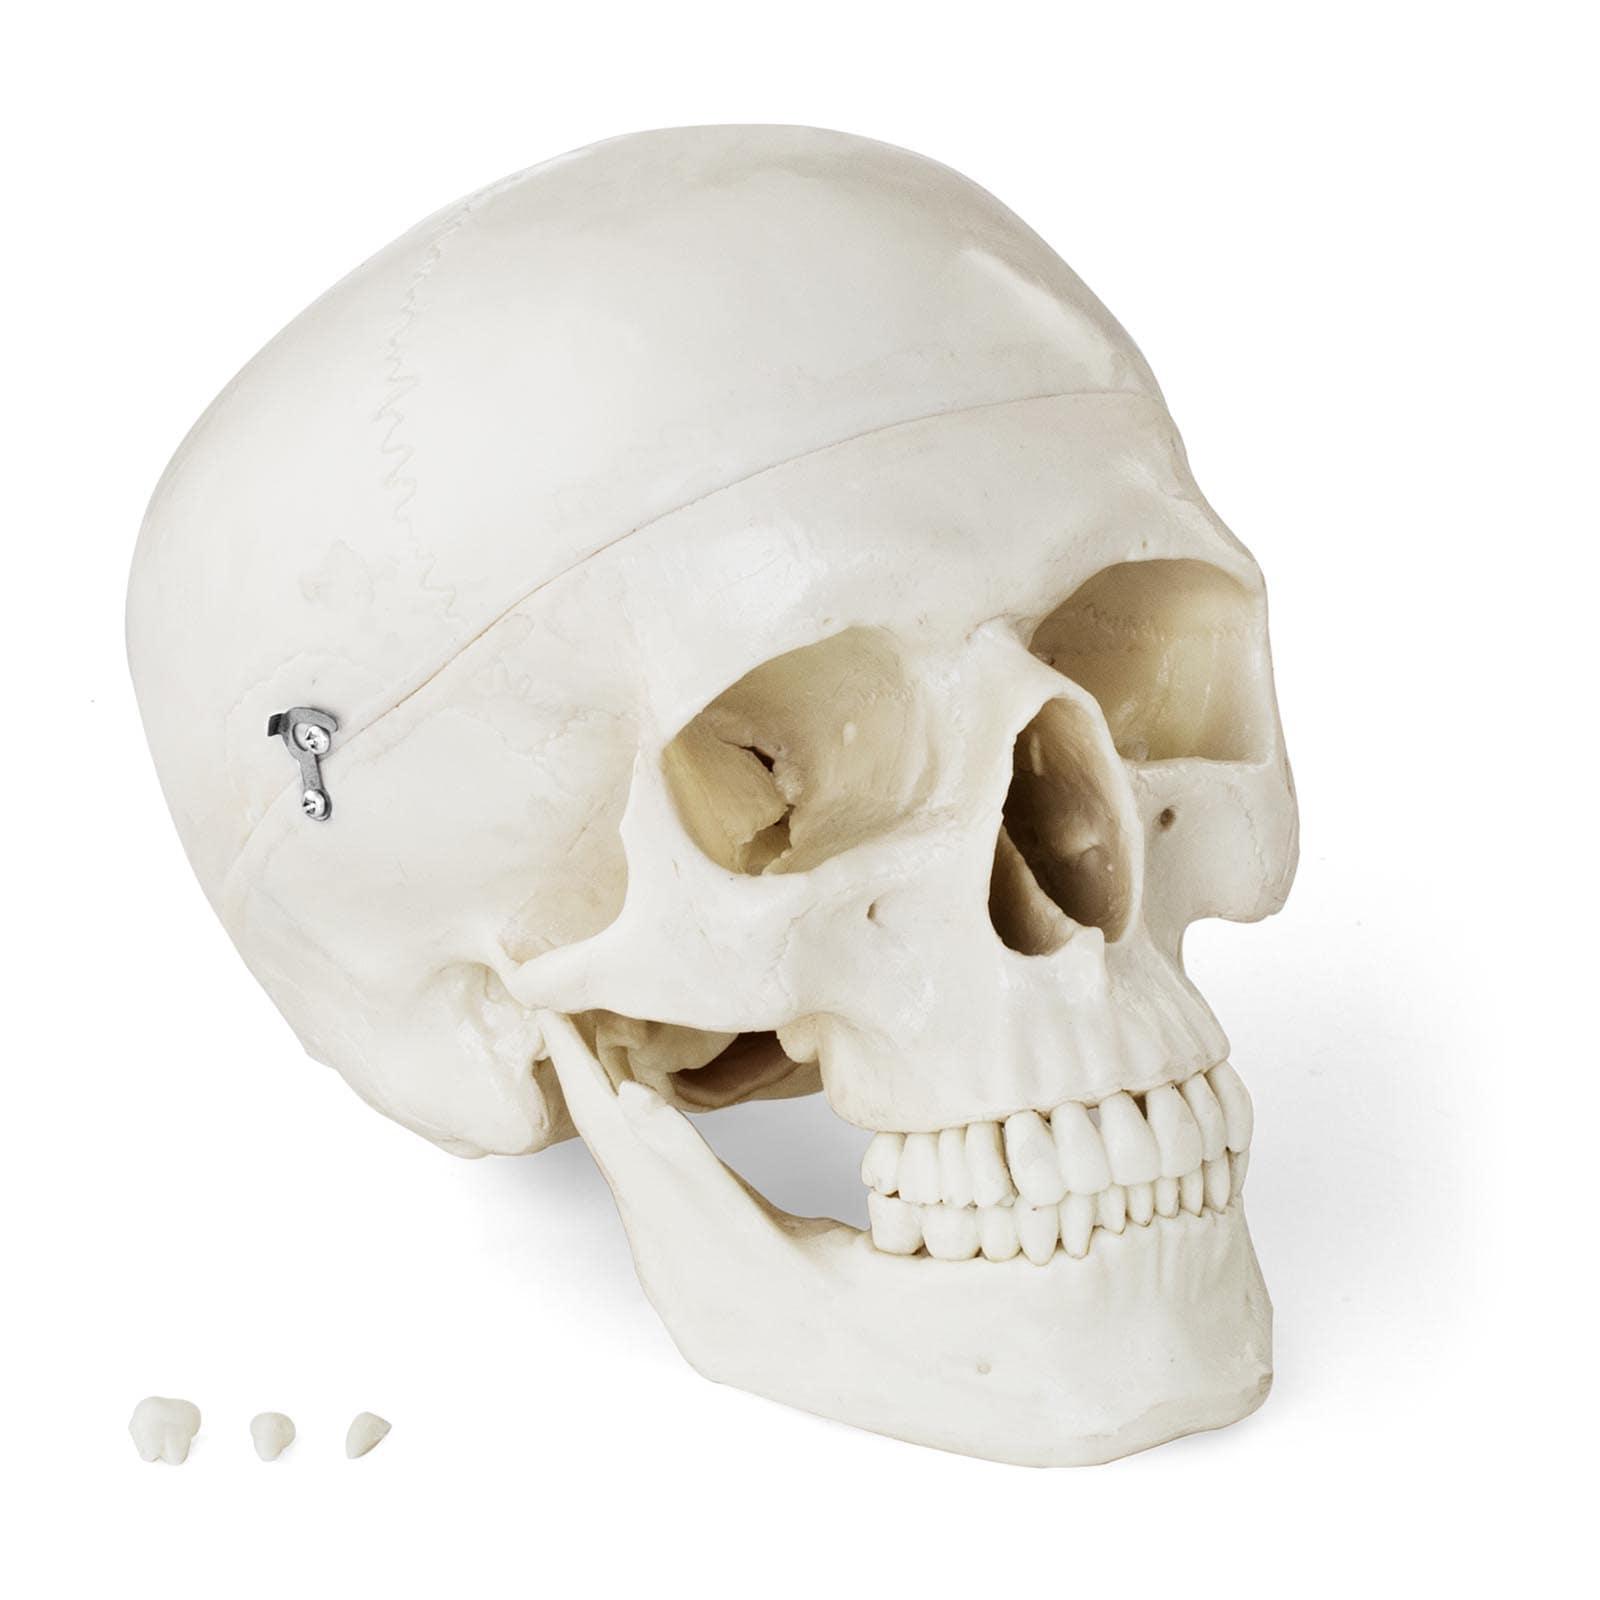 Modelli anatomici